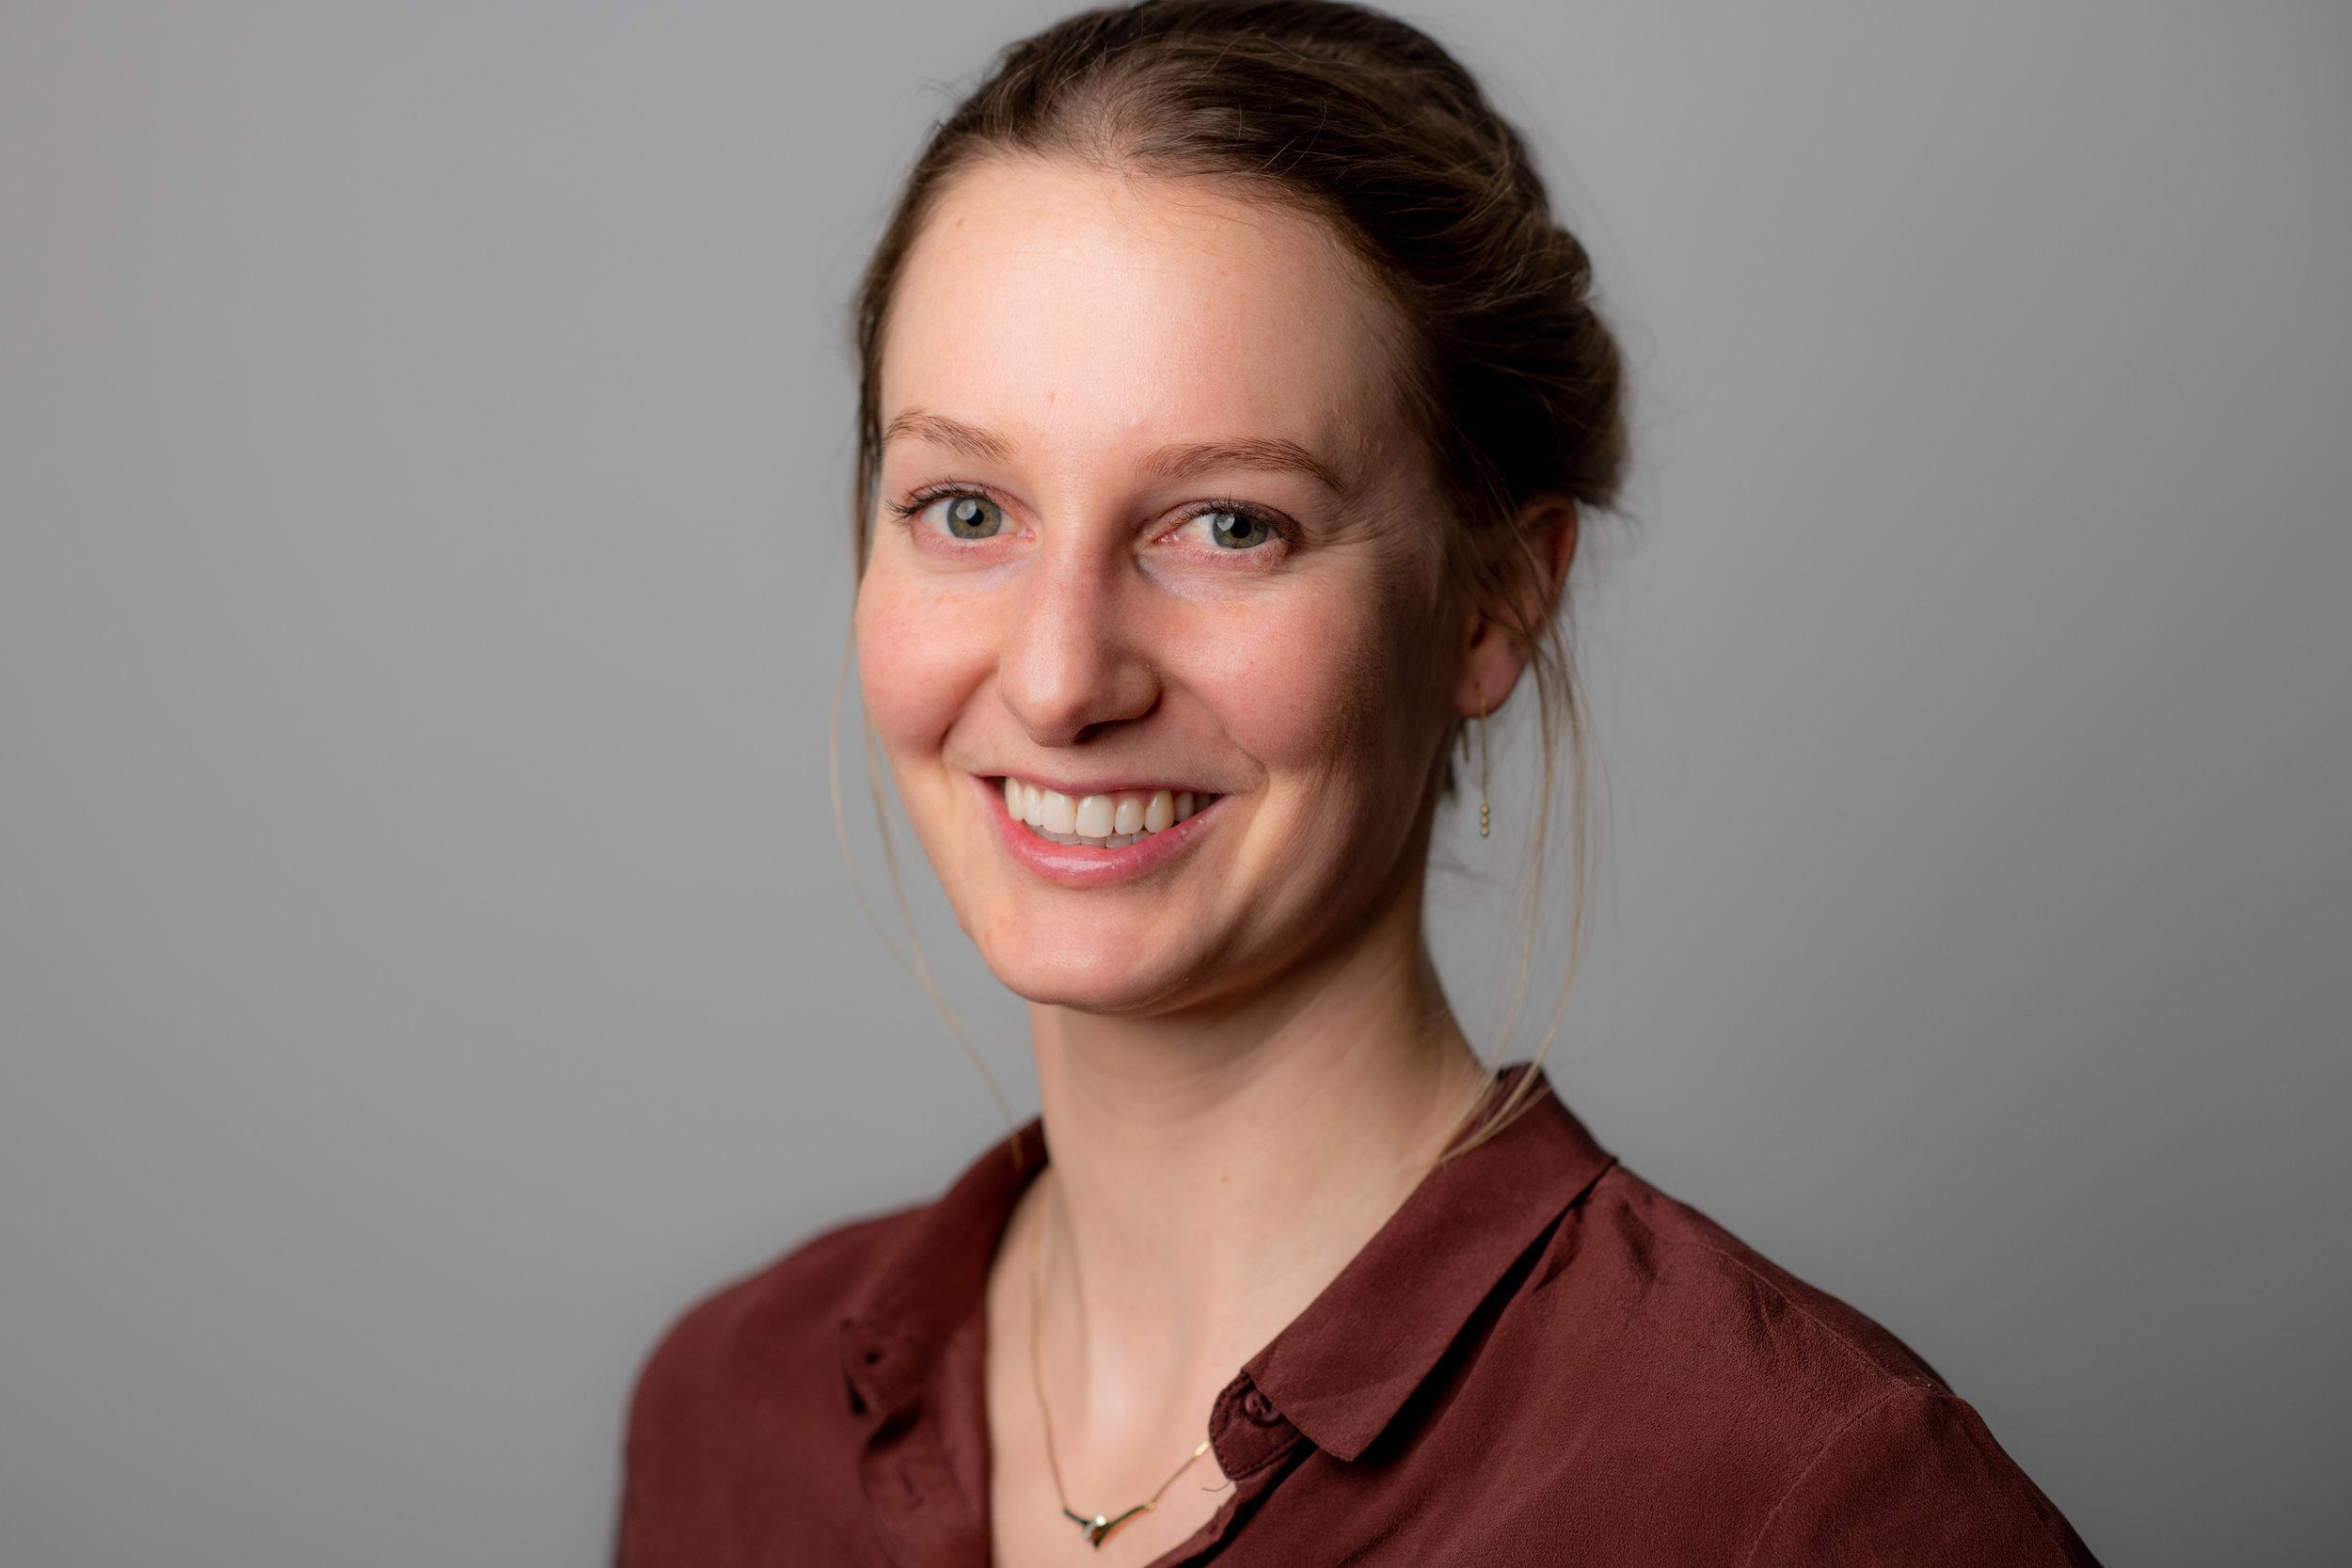 Medewerker Yvette Beumer Notarissen-7173.jpg